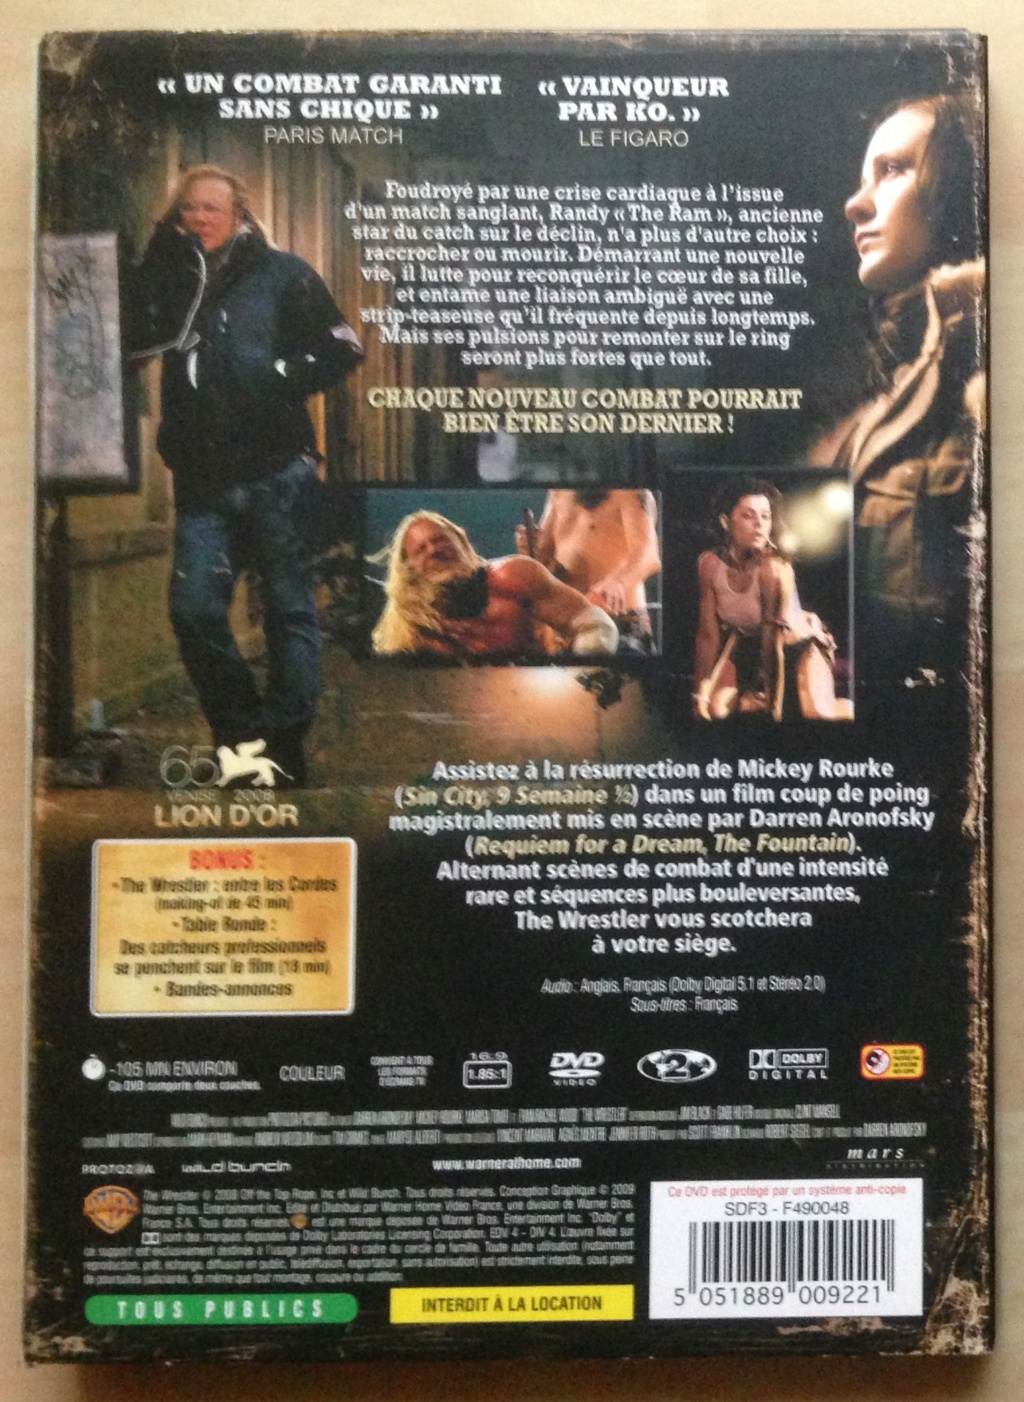 [DON/ECH] Le gros foutoir DVD [MAJ 10/05] - Page 6 Img_0511